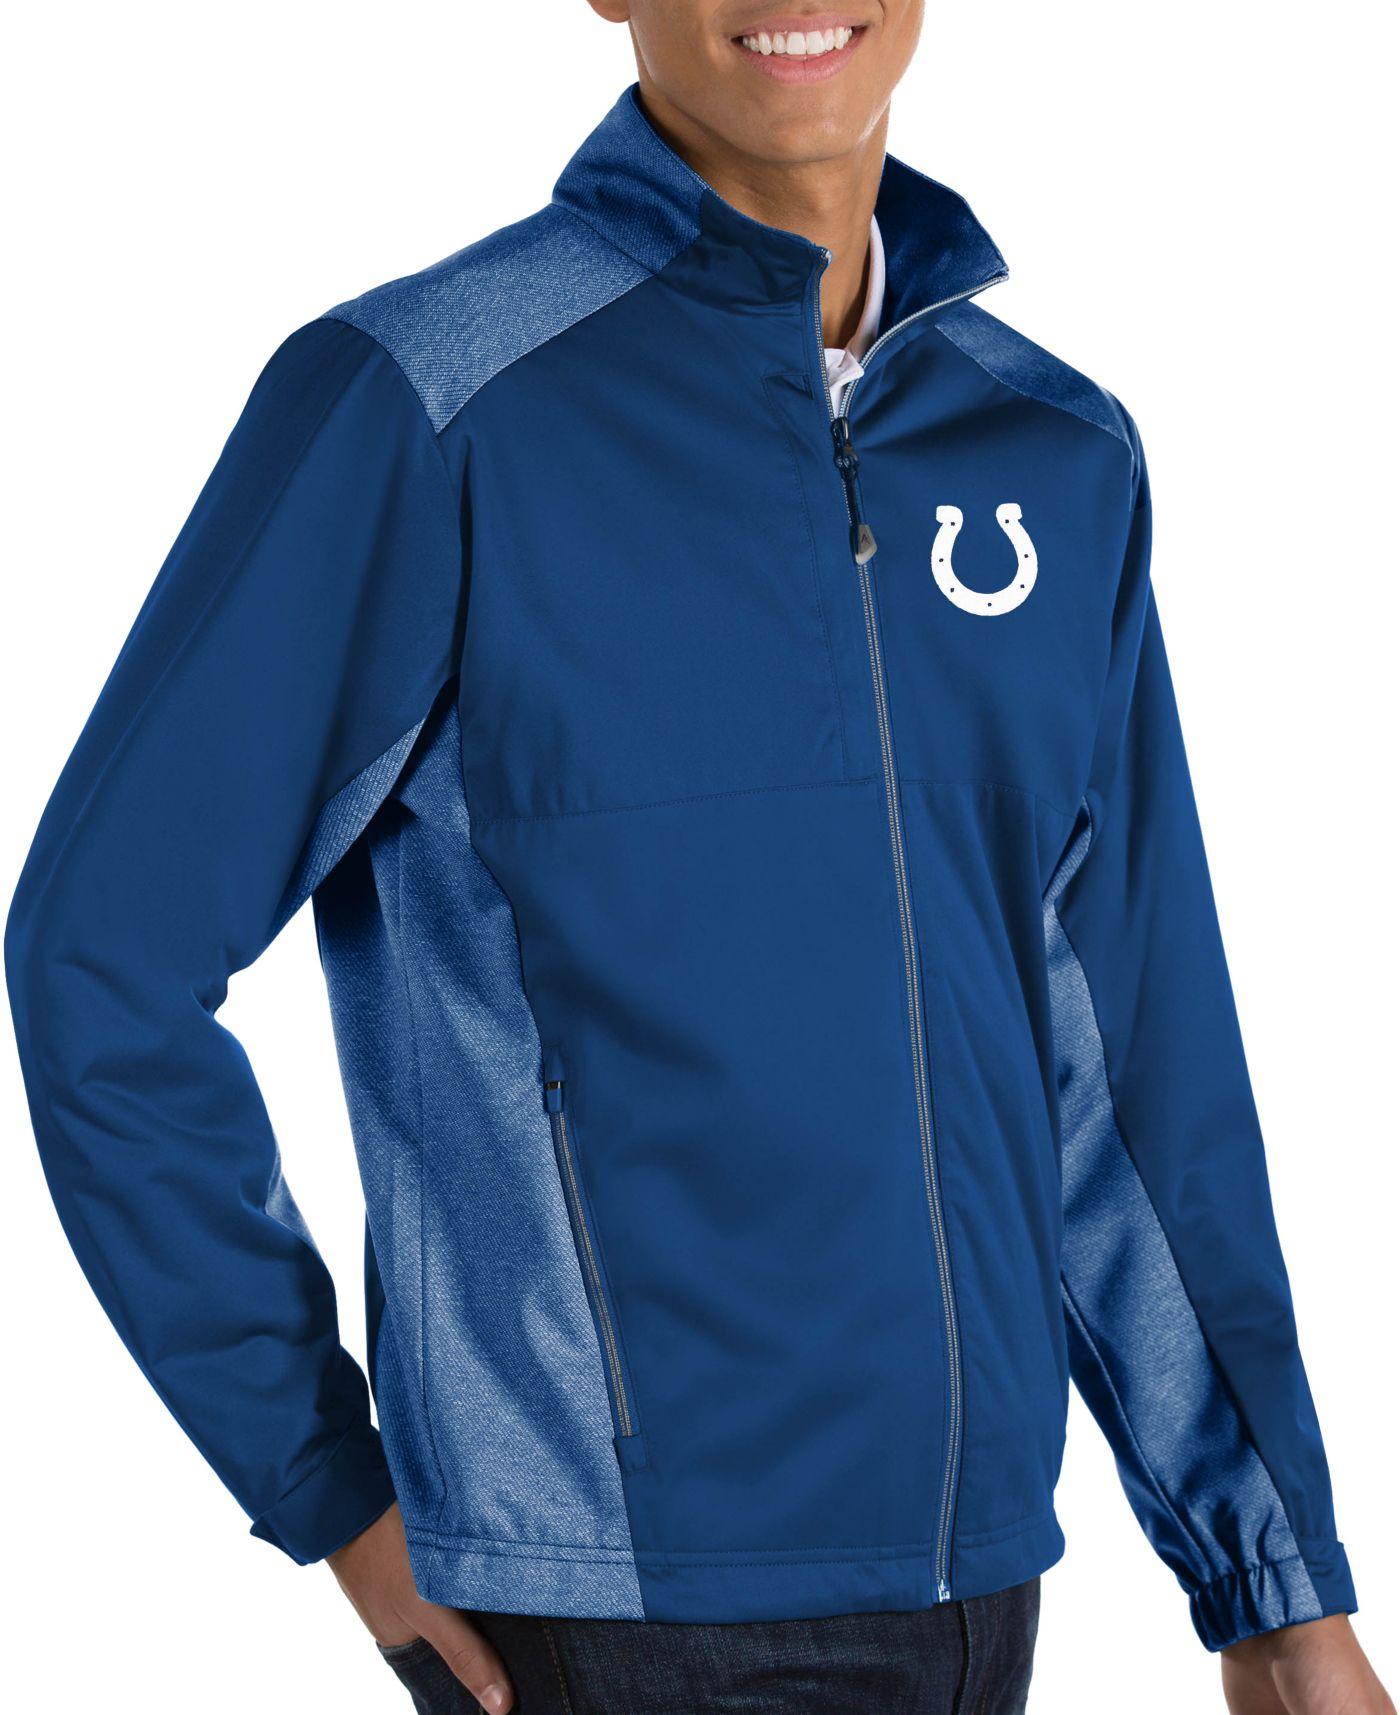 Antigua Men's Indianapolis Colts Revolve Blue Full-Zip Jacket